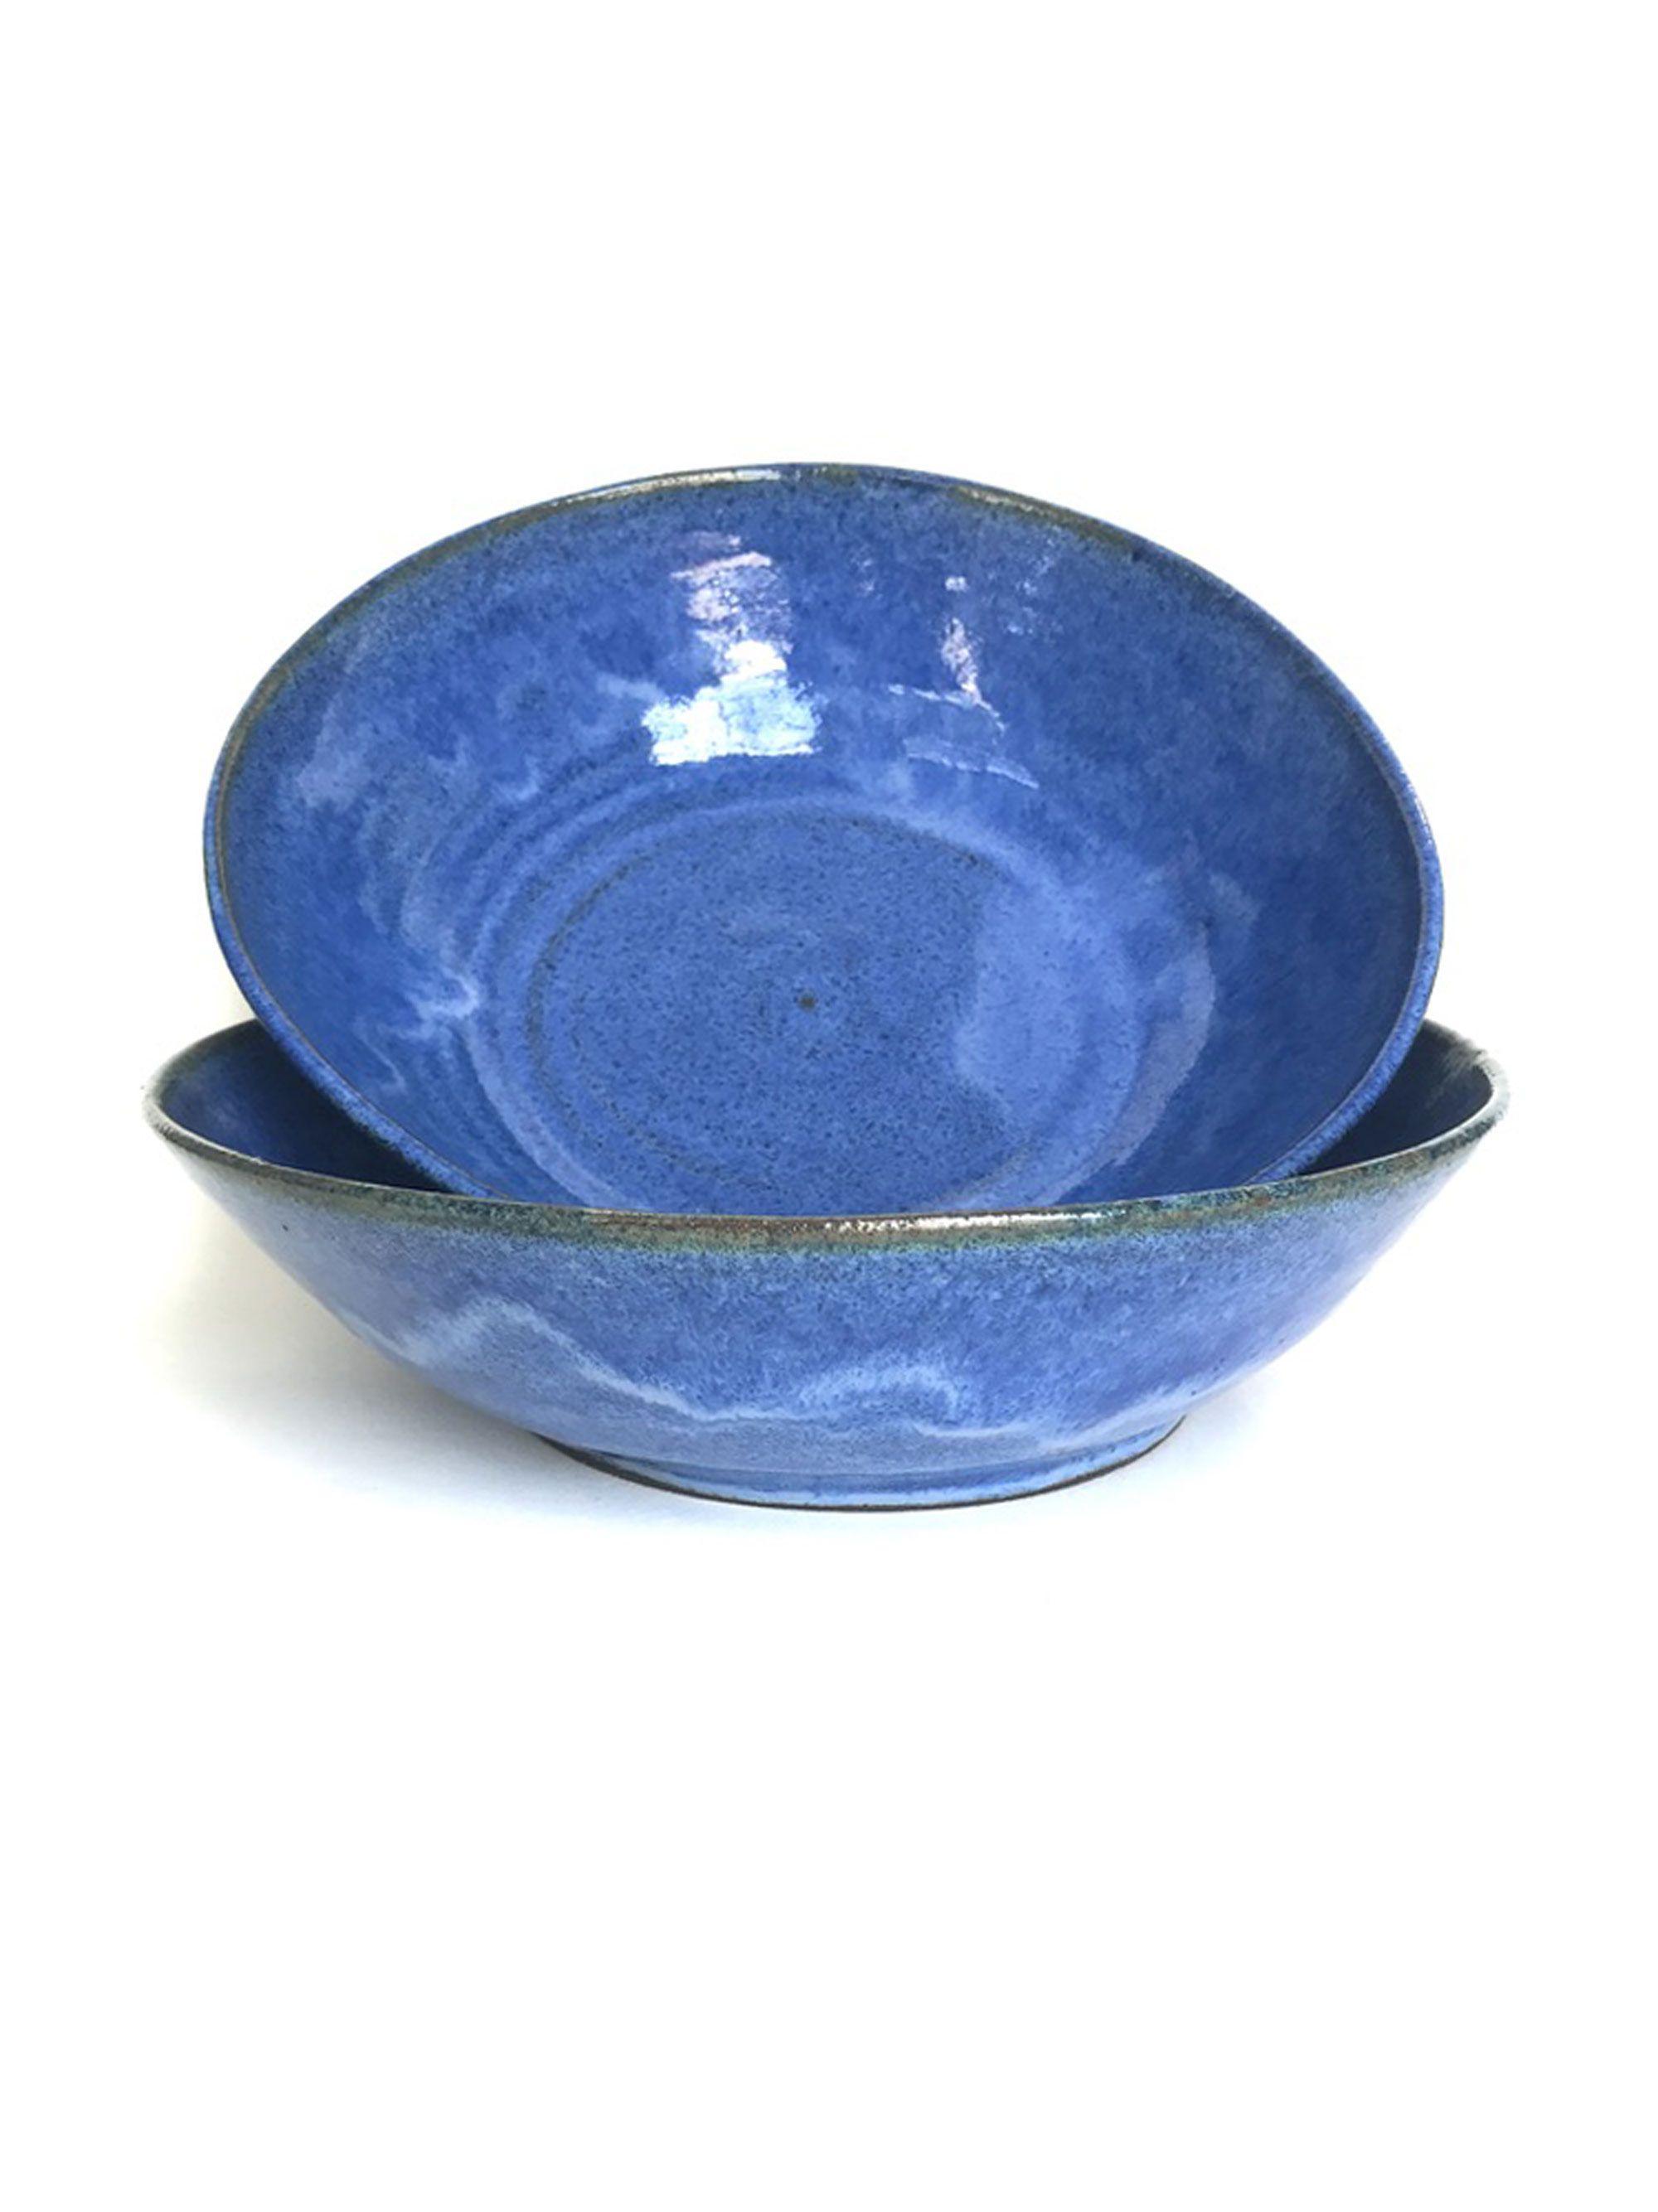 My blue devils. 10 inches.     www.amhceramics.etsy.com  #veganlife #wfpbdiets #vegan #wholefoodplantbaseddiet #claytalk #ceramics #clayinginsd #etsymudteam #ceramicstudio #potterylove #handmadepottery #ceramiclove #etsyfinds #inmykitchen #onmytable #handmadeisbetter #instapottery #pottersofinstagram #claystagram